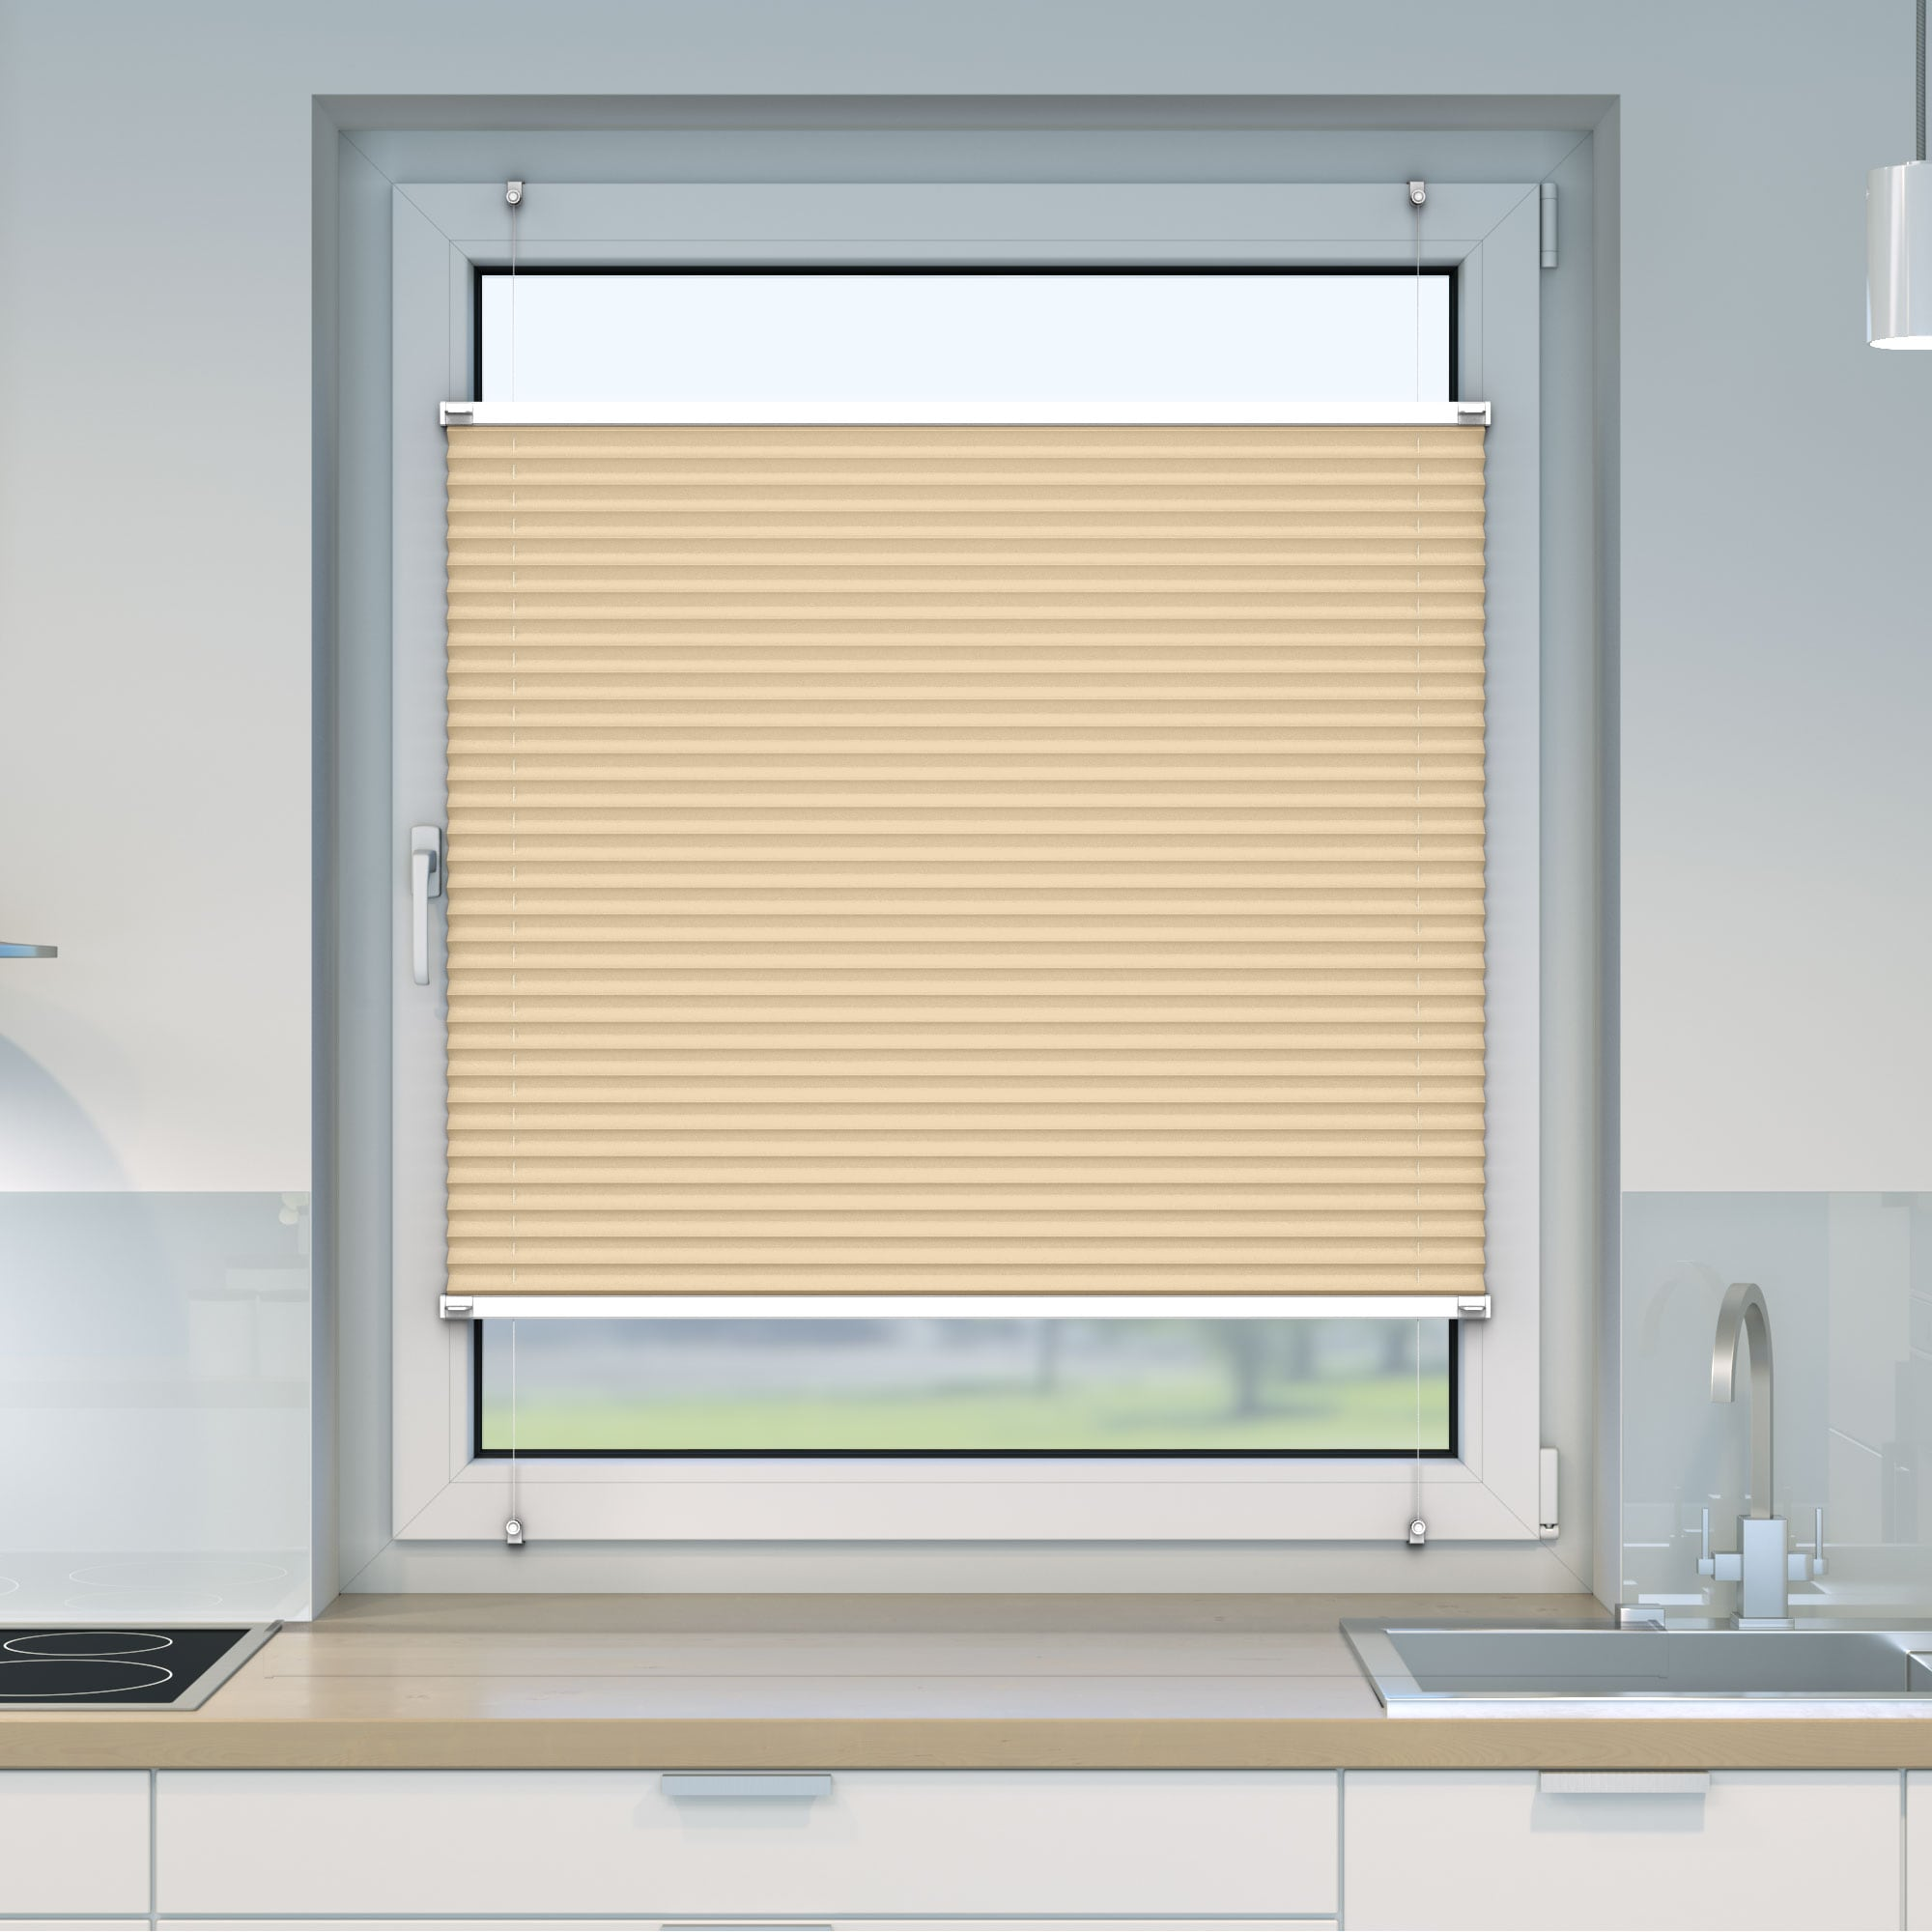 Klemmfix-Plissee-Faltrollo-ohne-Bohren-Fenster-Tuer-Plisseerollo-Plisee-Easyfix Indexbild 11